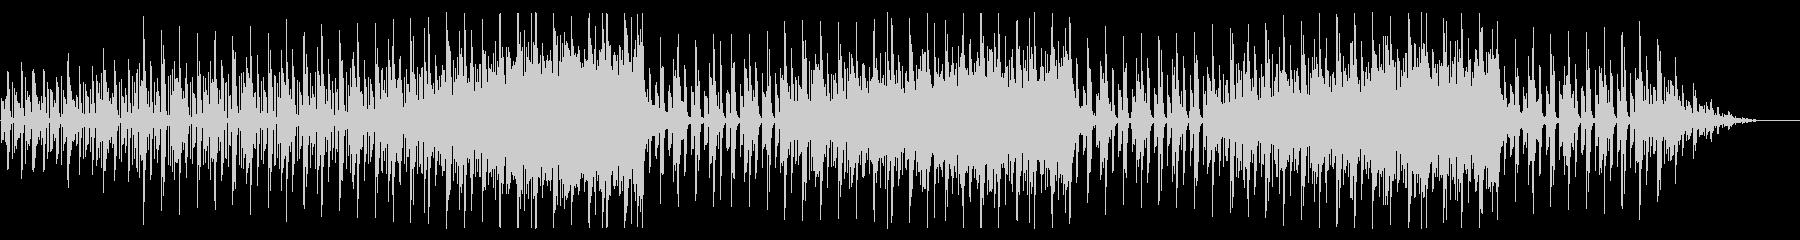 bgm47の未再生の波形